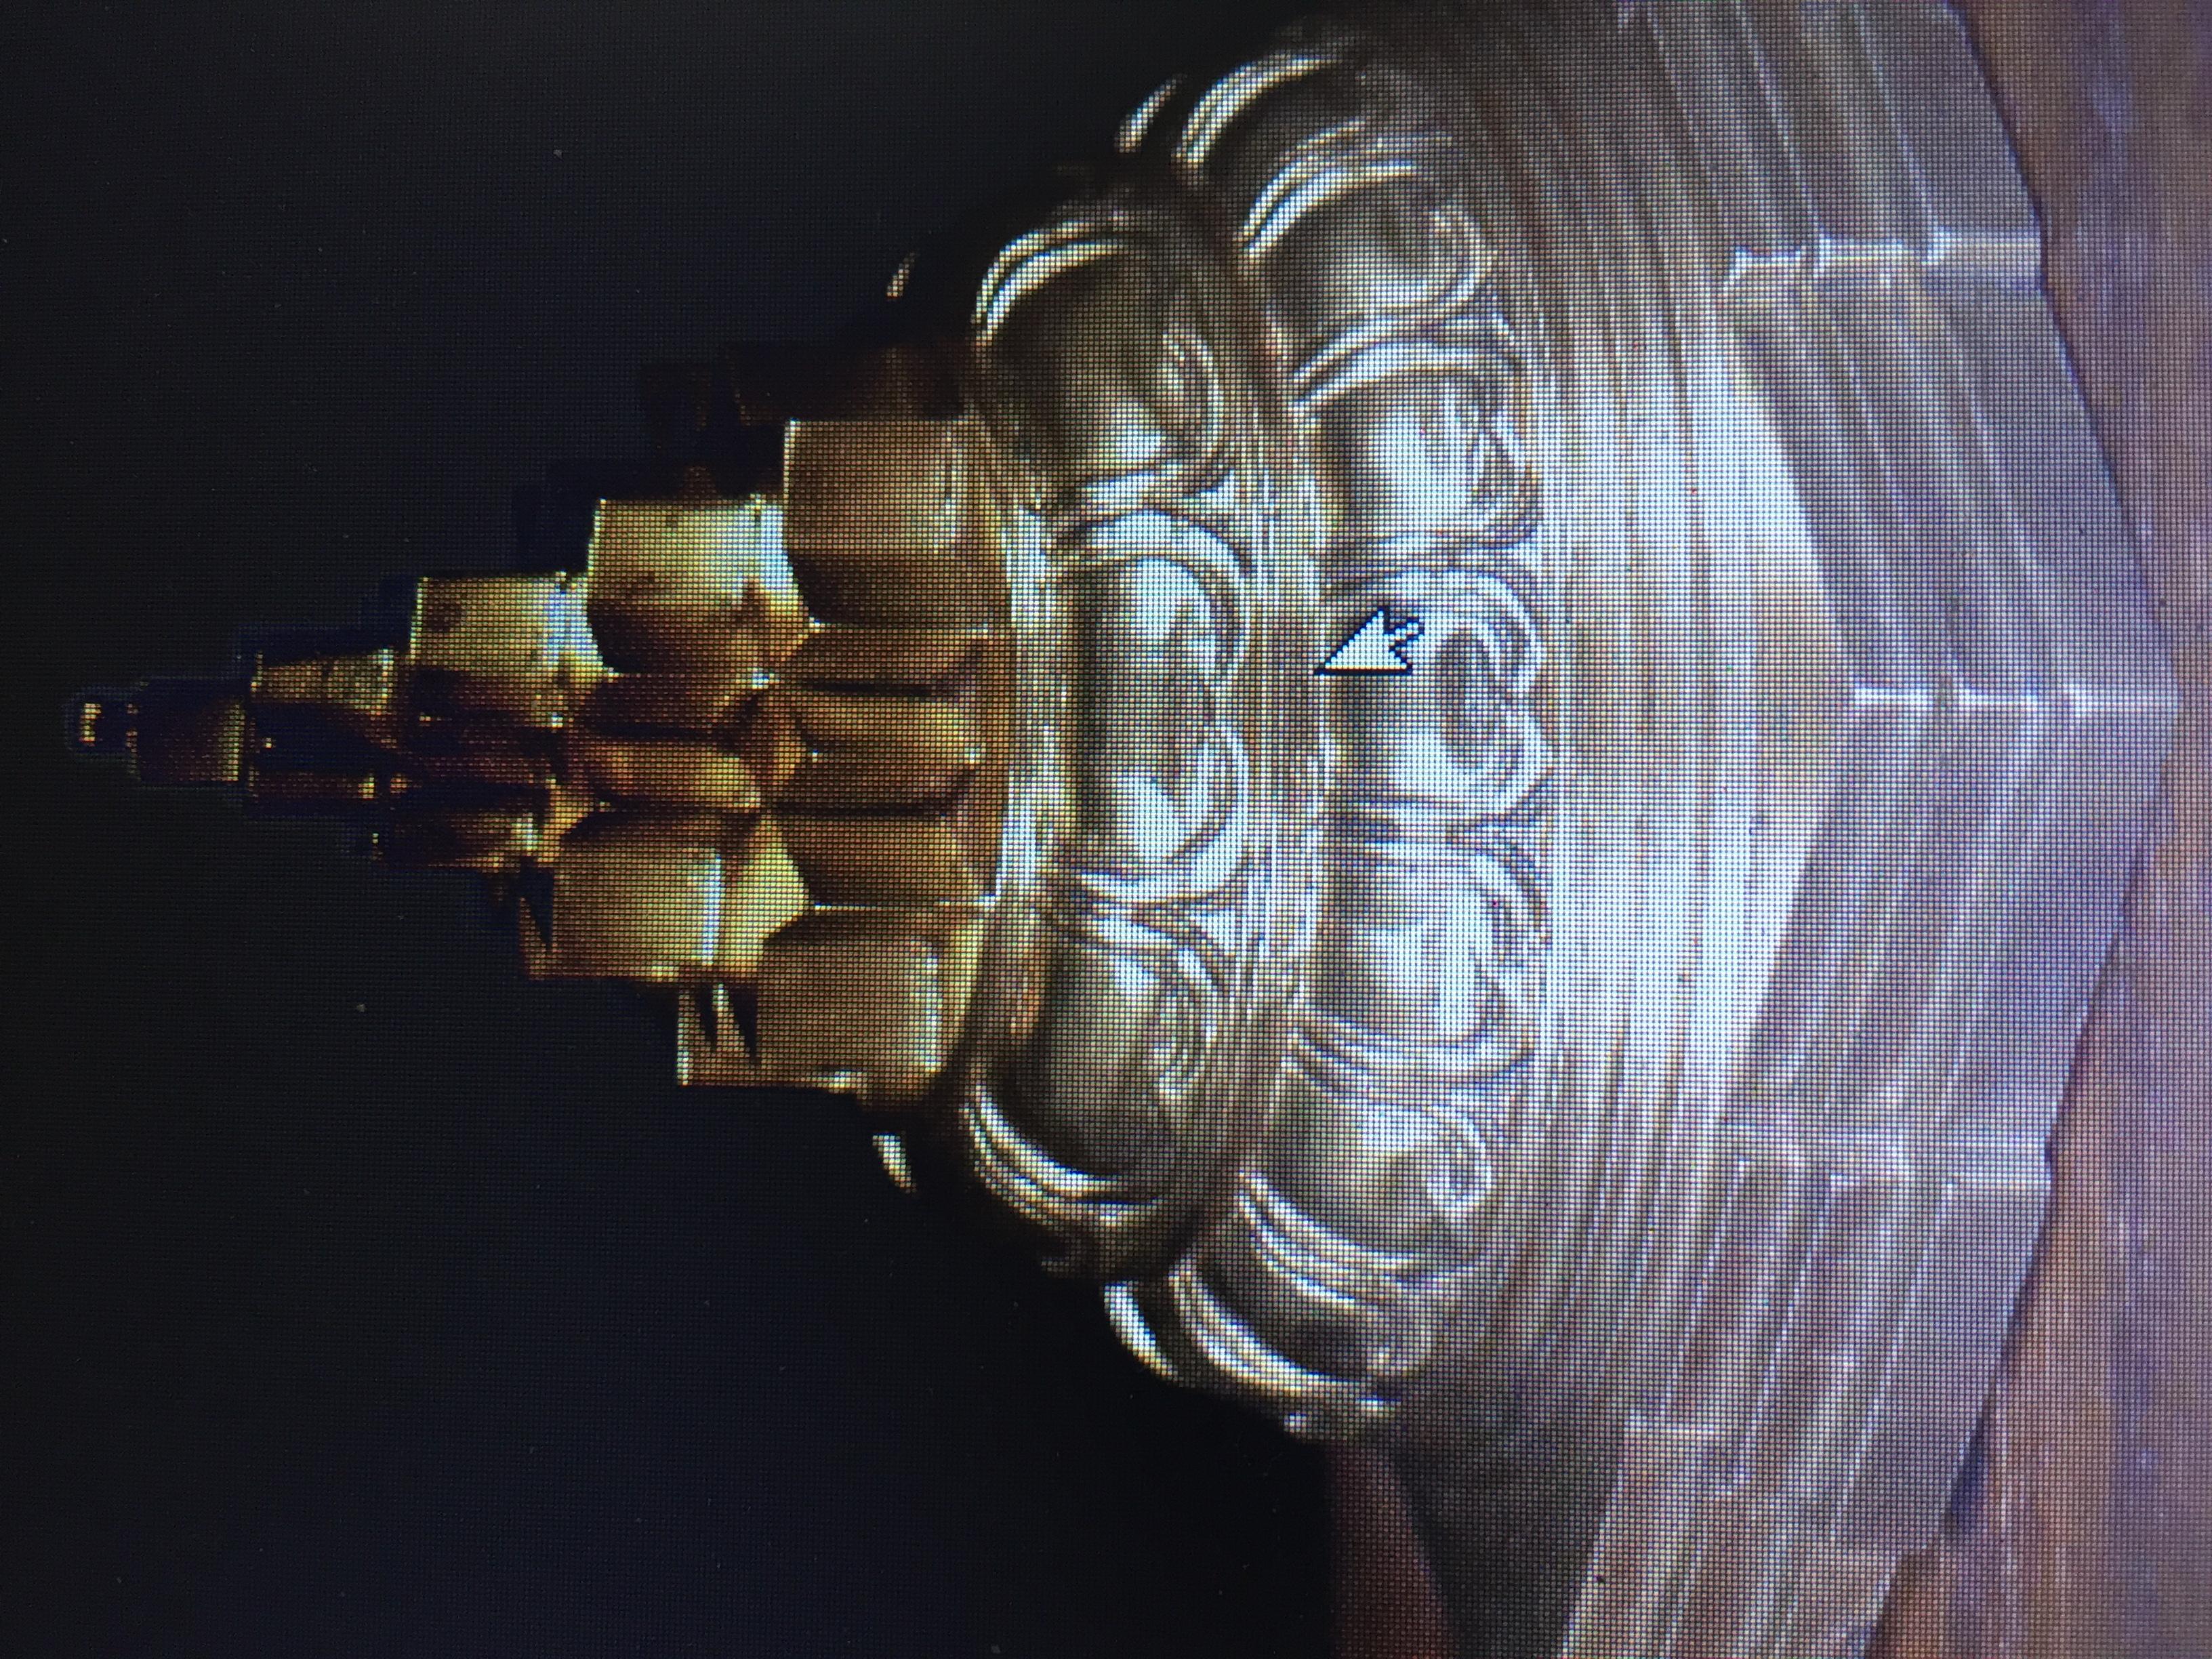 File:Srichakra durga parameswari jpg - Wikimedia Commons